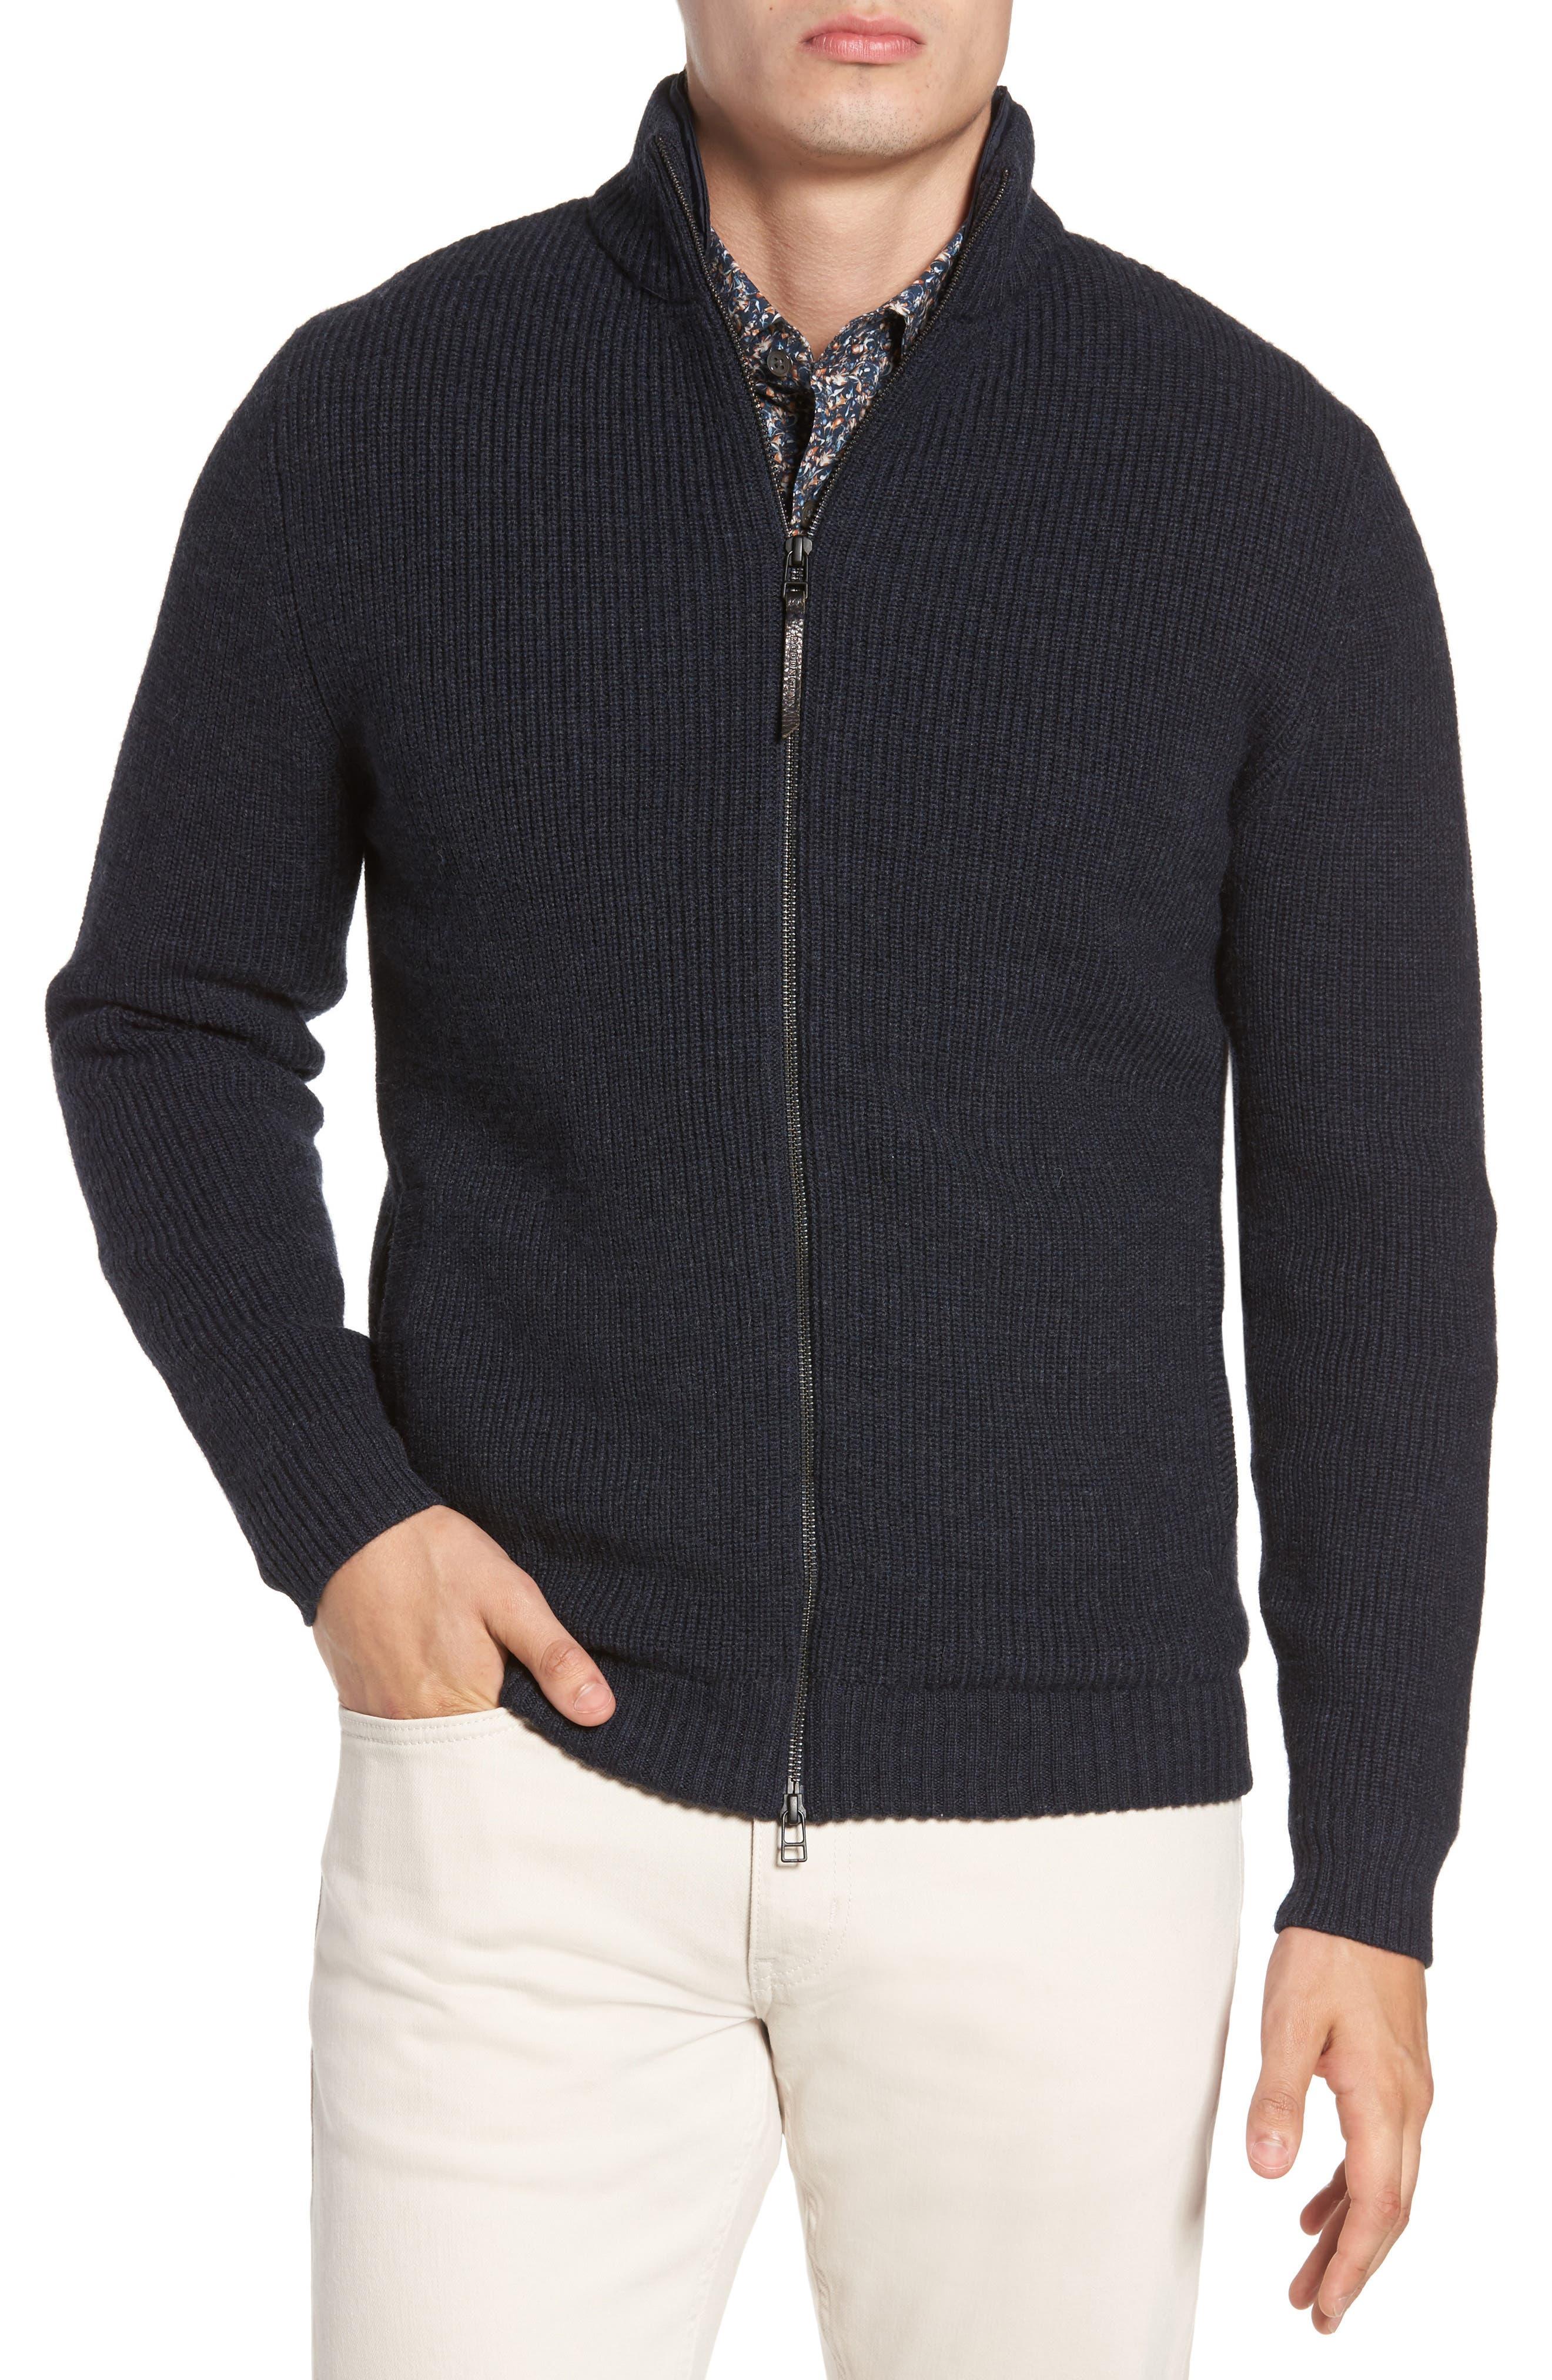 RODD & GUNN, Camerons Track Zip Wool Sweater, Main thumbnail 1, color, 412